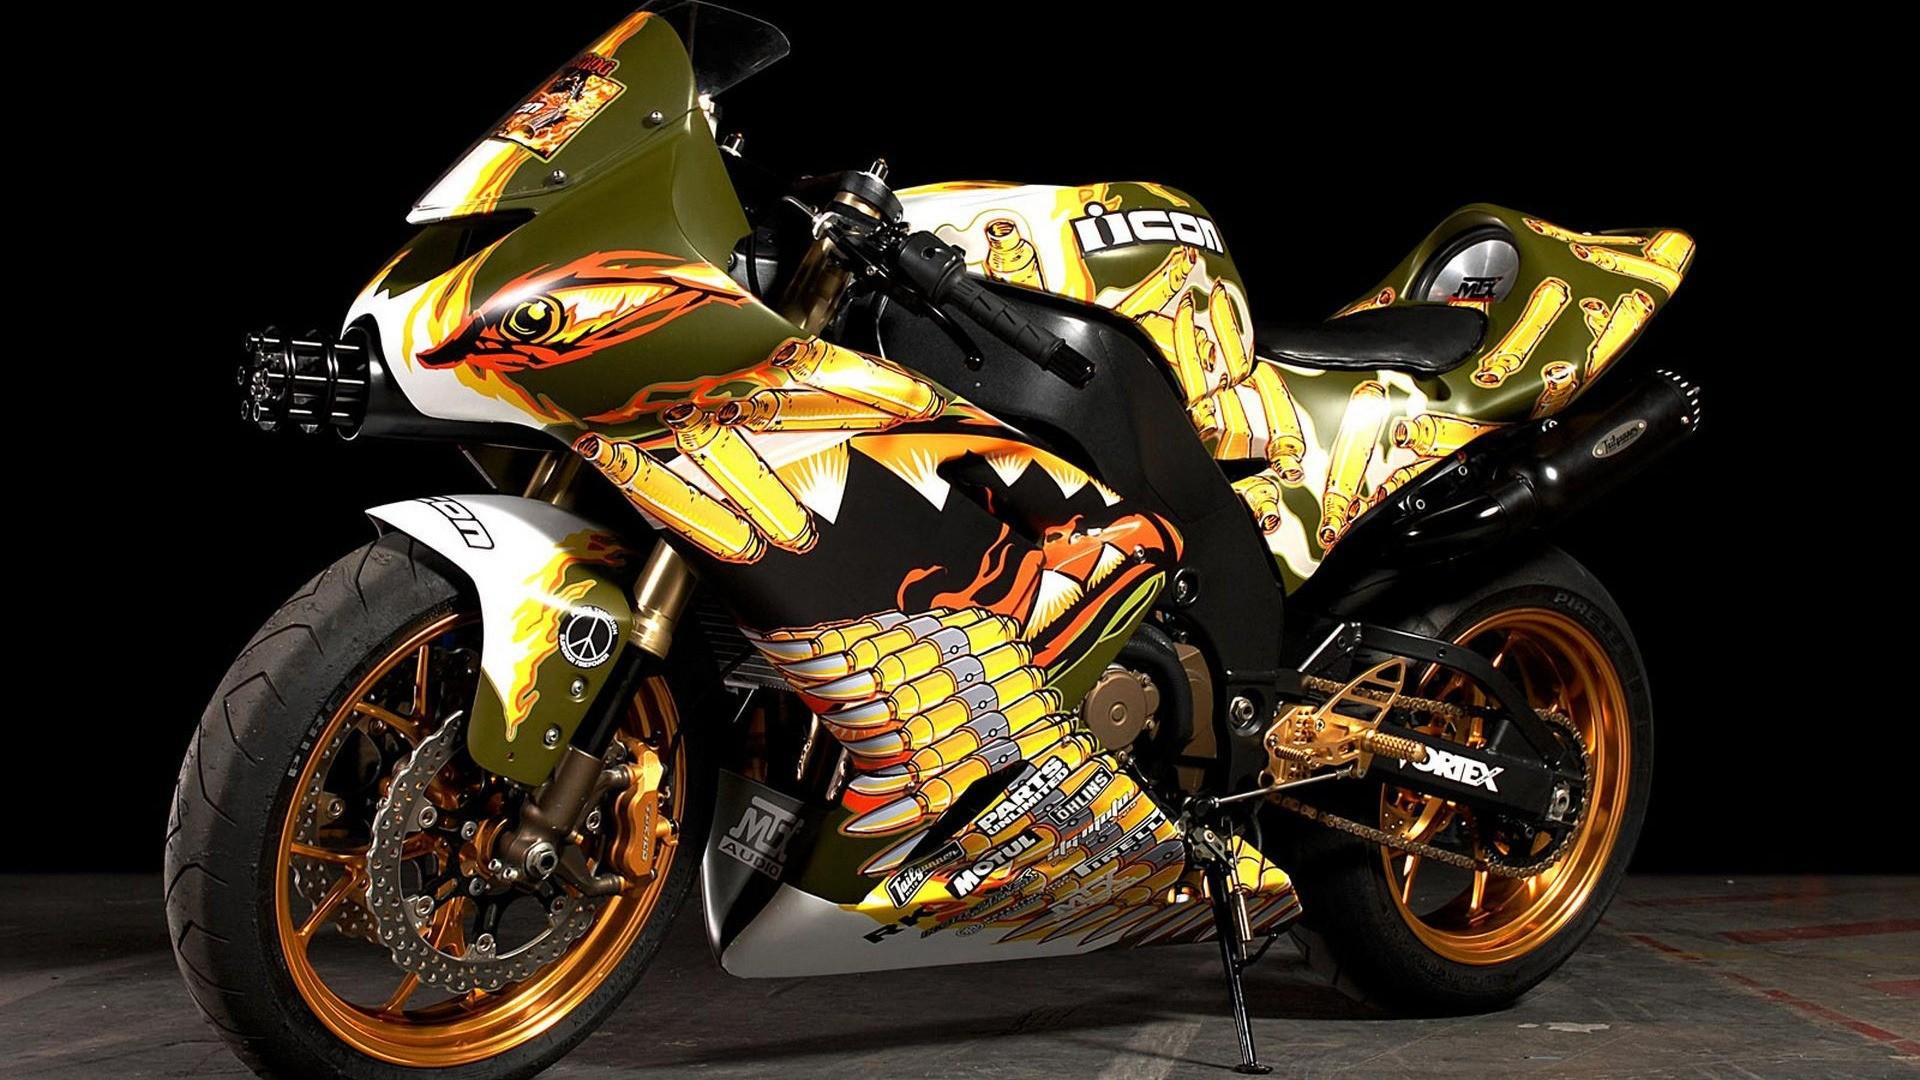 Картинки мотоциклов крутые, дурачку александра открытки